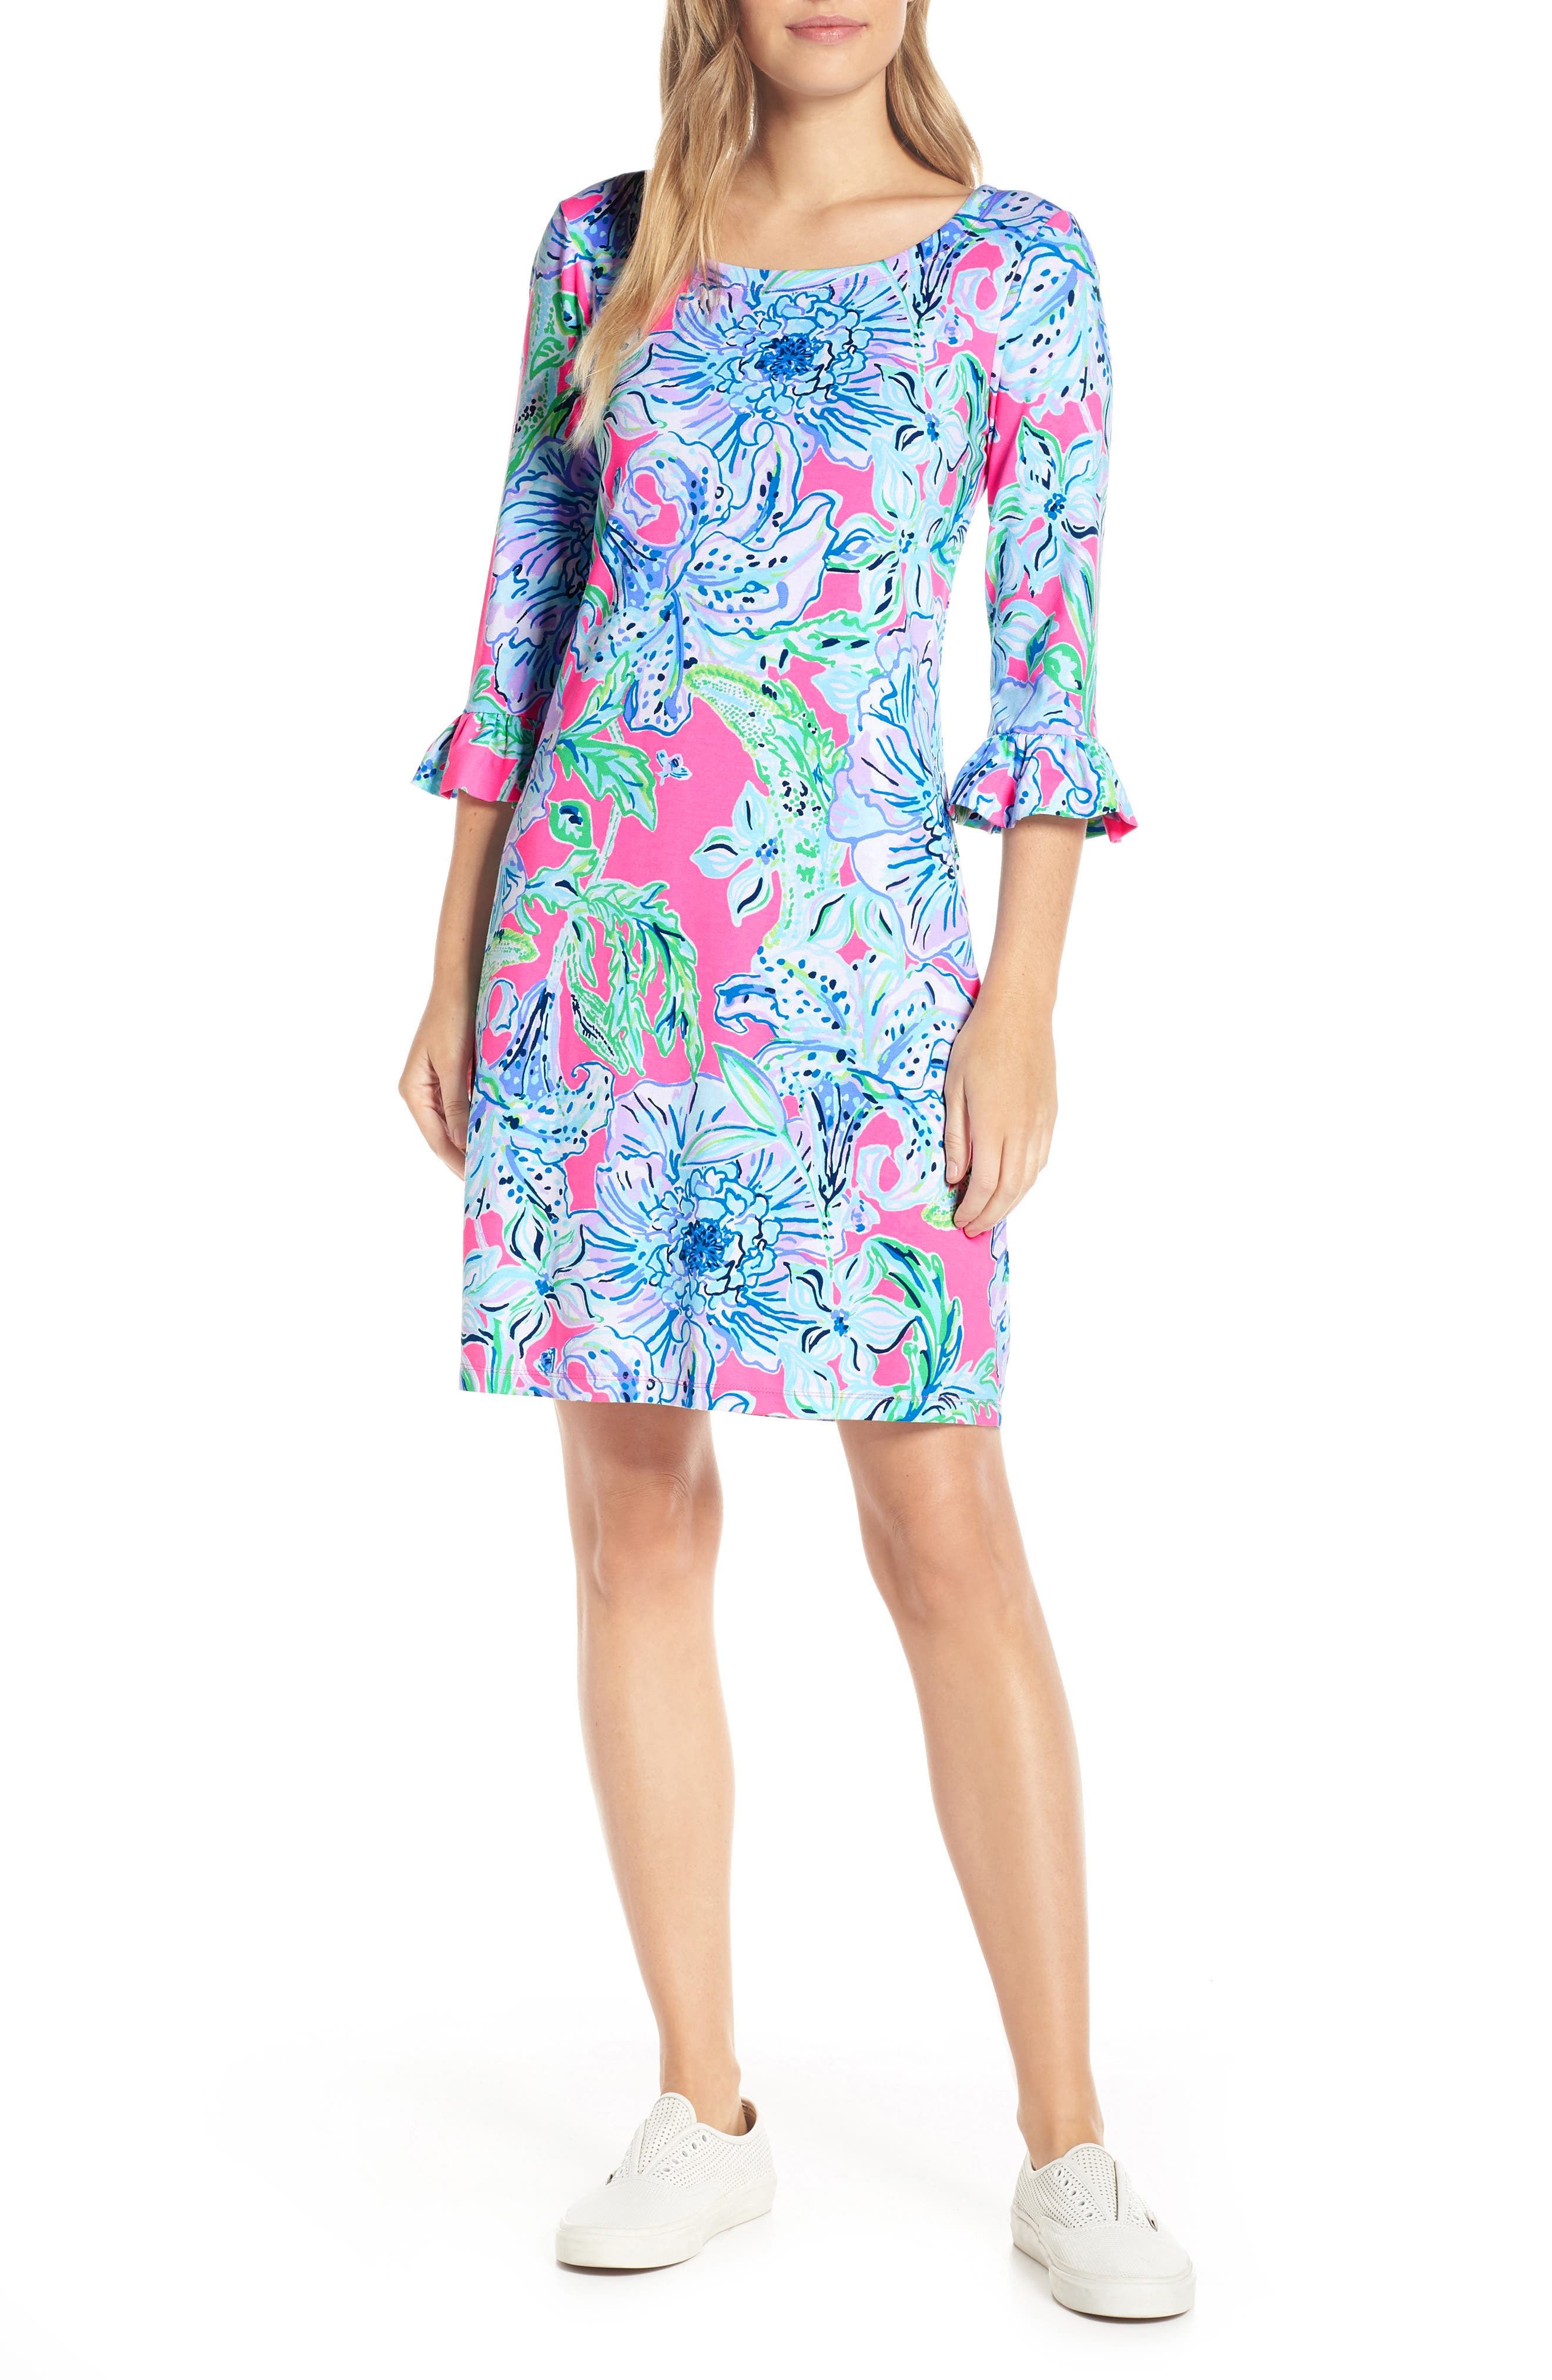 Lilly Pulitzer Sophie Upf 50+ Shift Dress, Pink